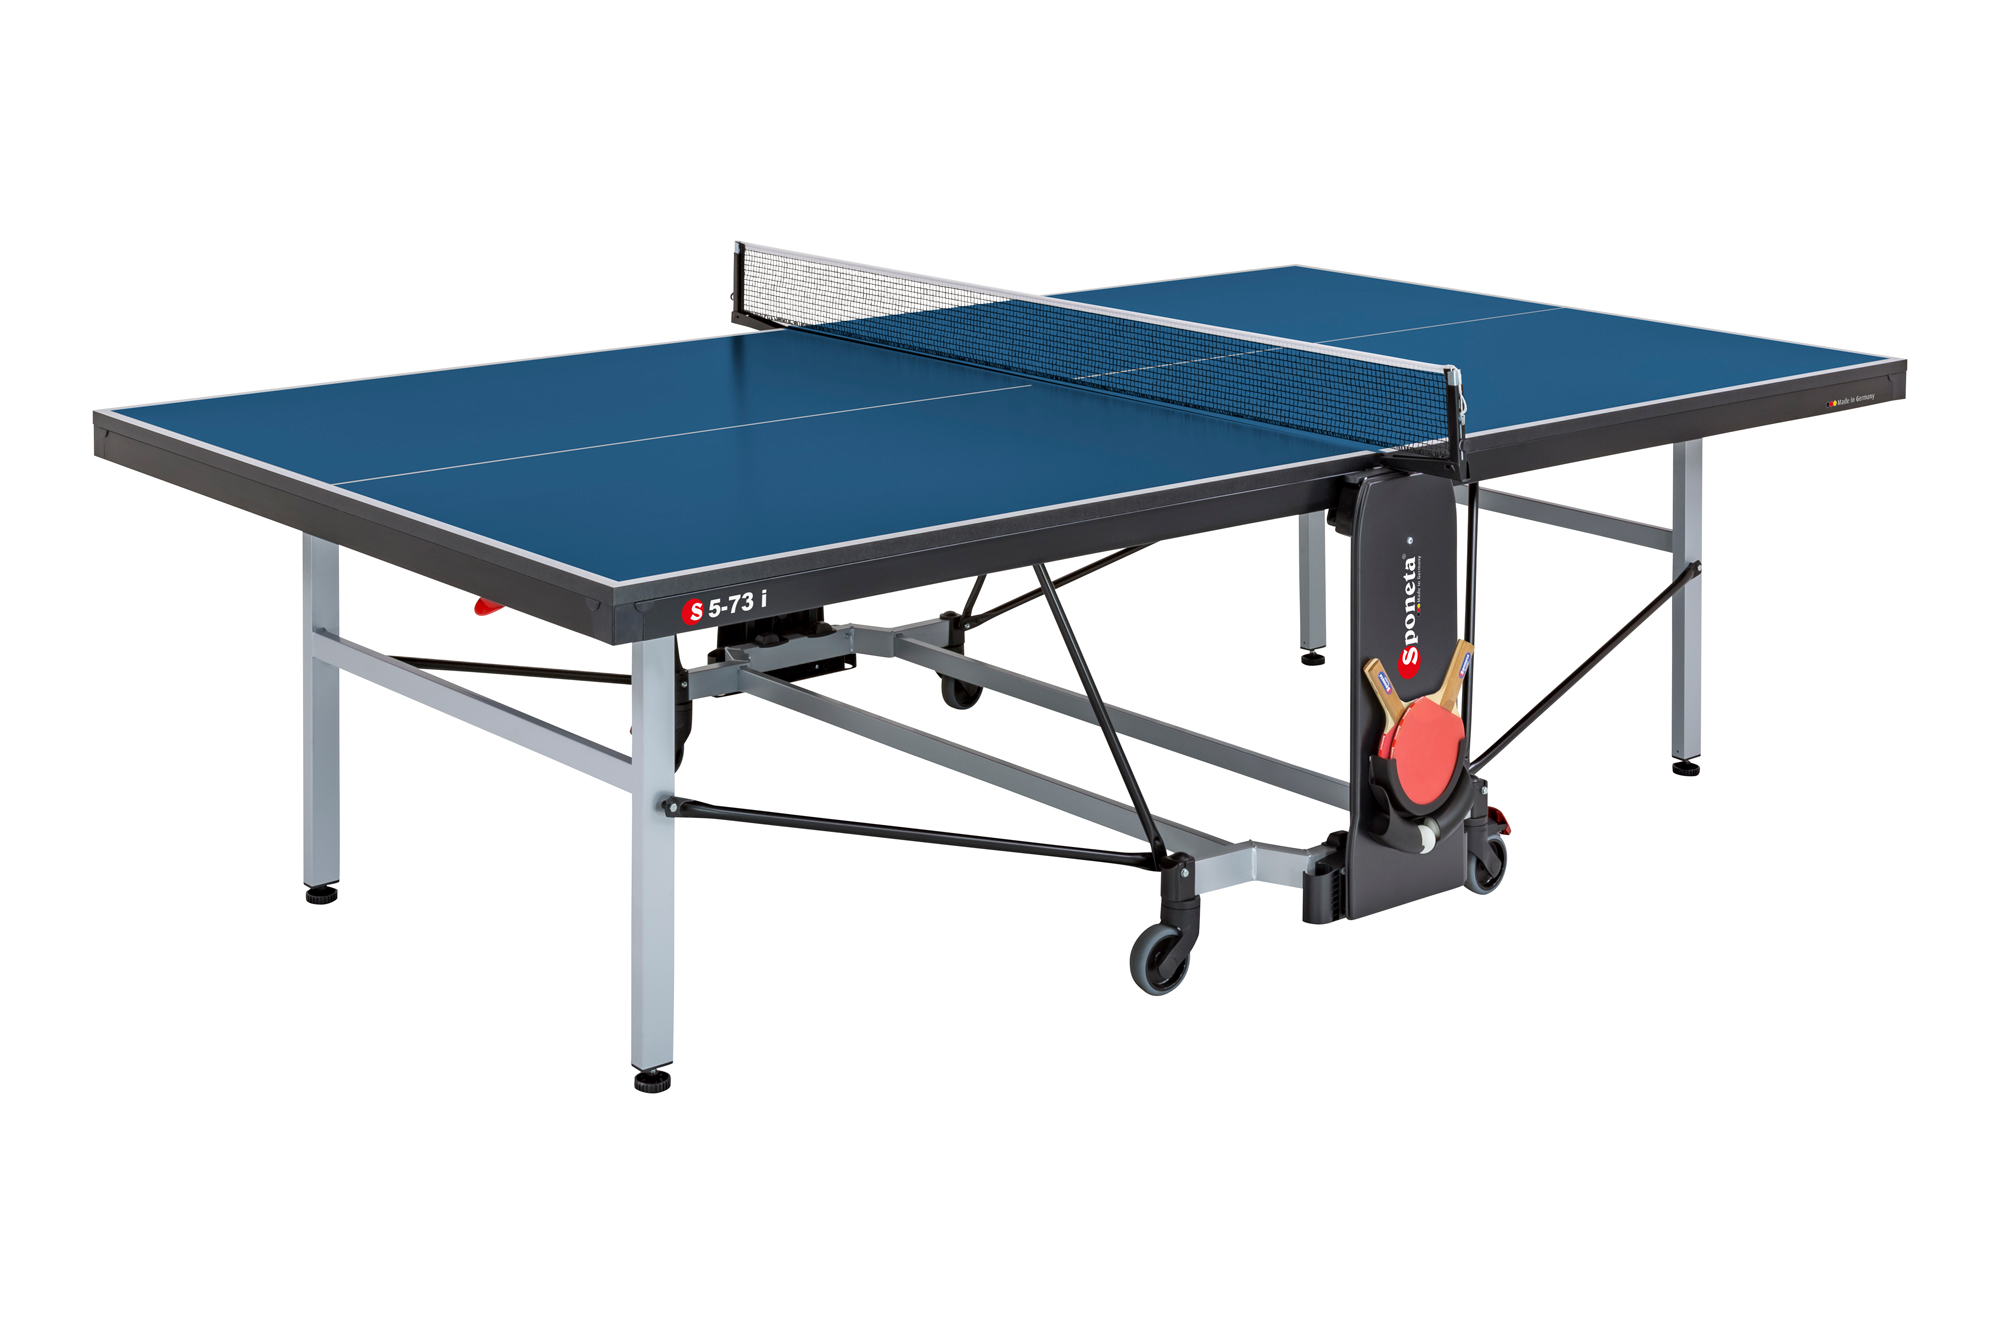 Sponeta S5-73i tafeltennistafel schoolline compact plus blauw